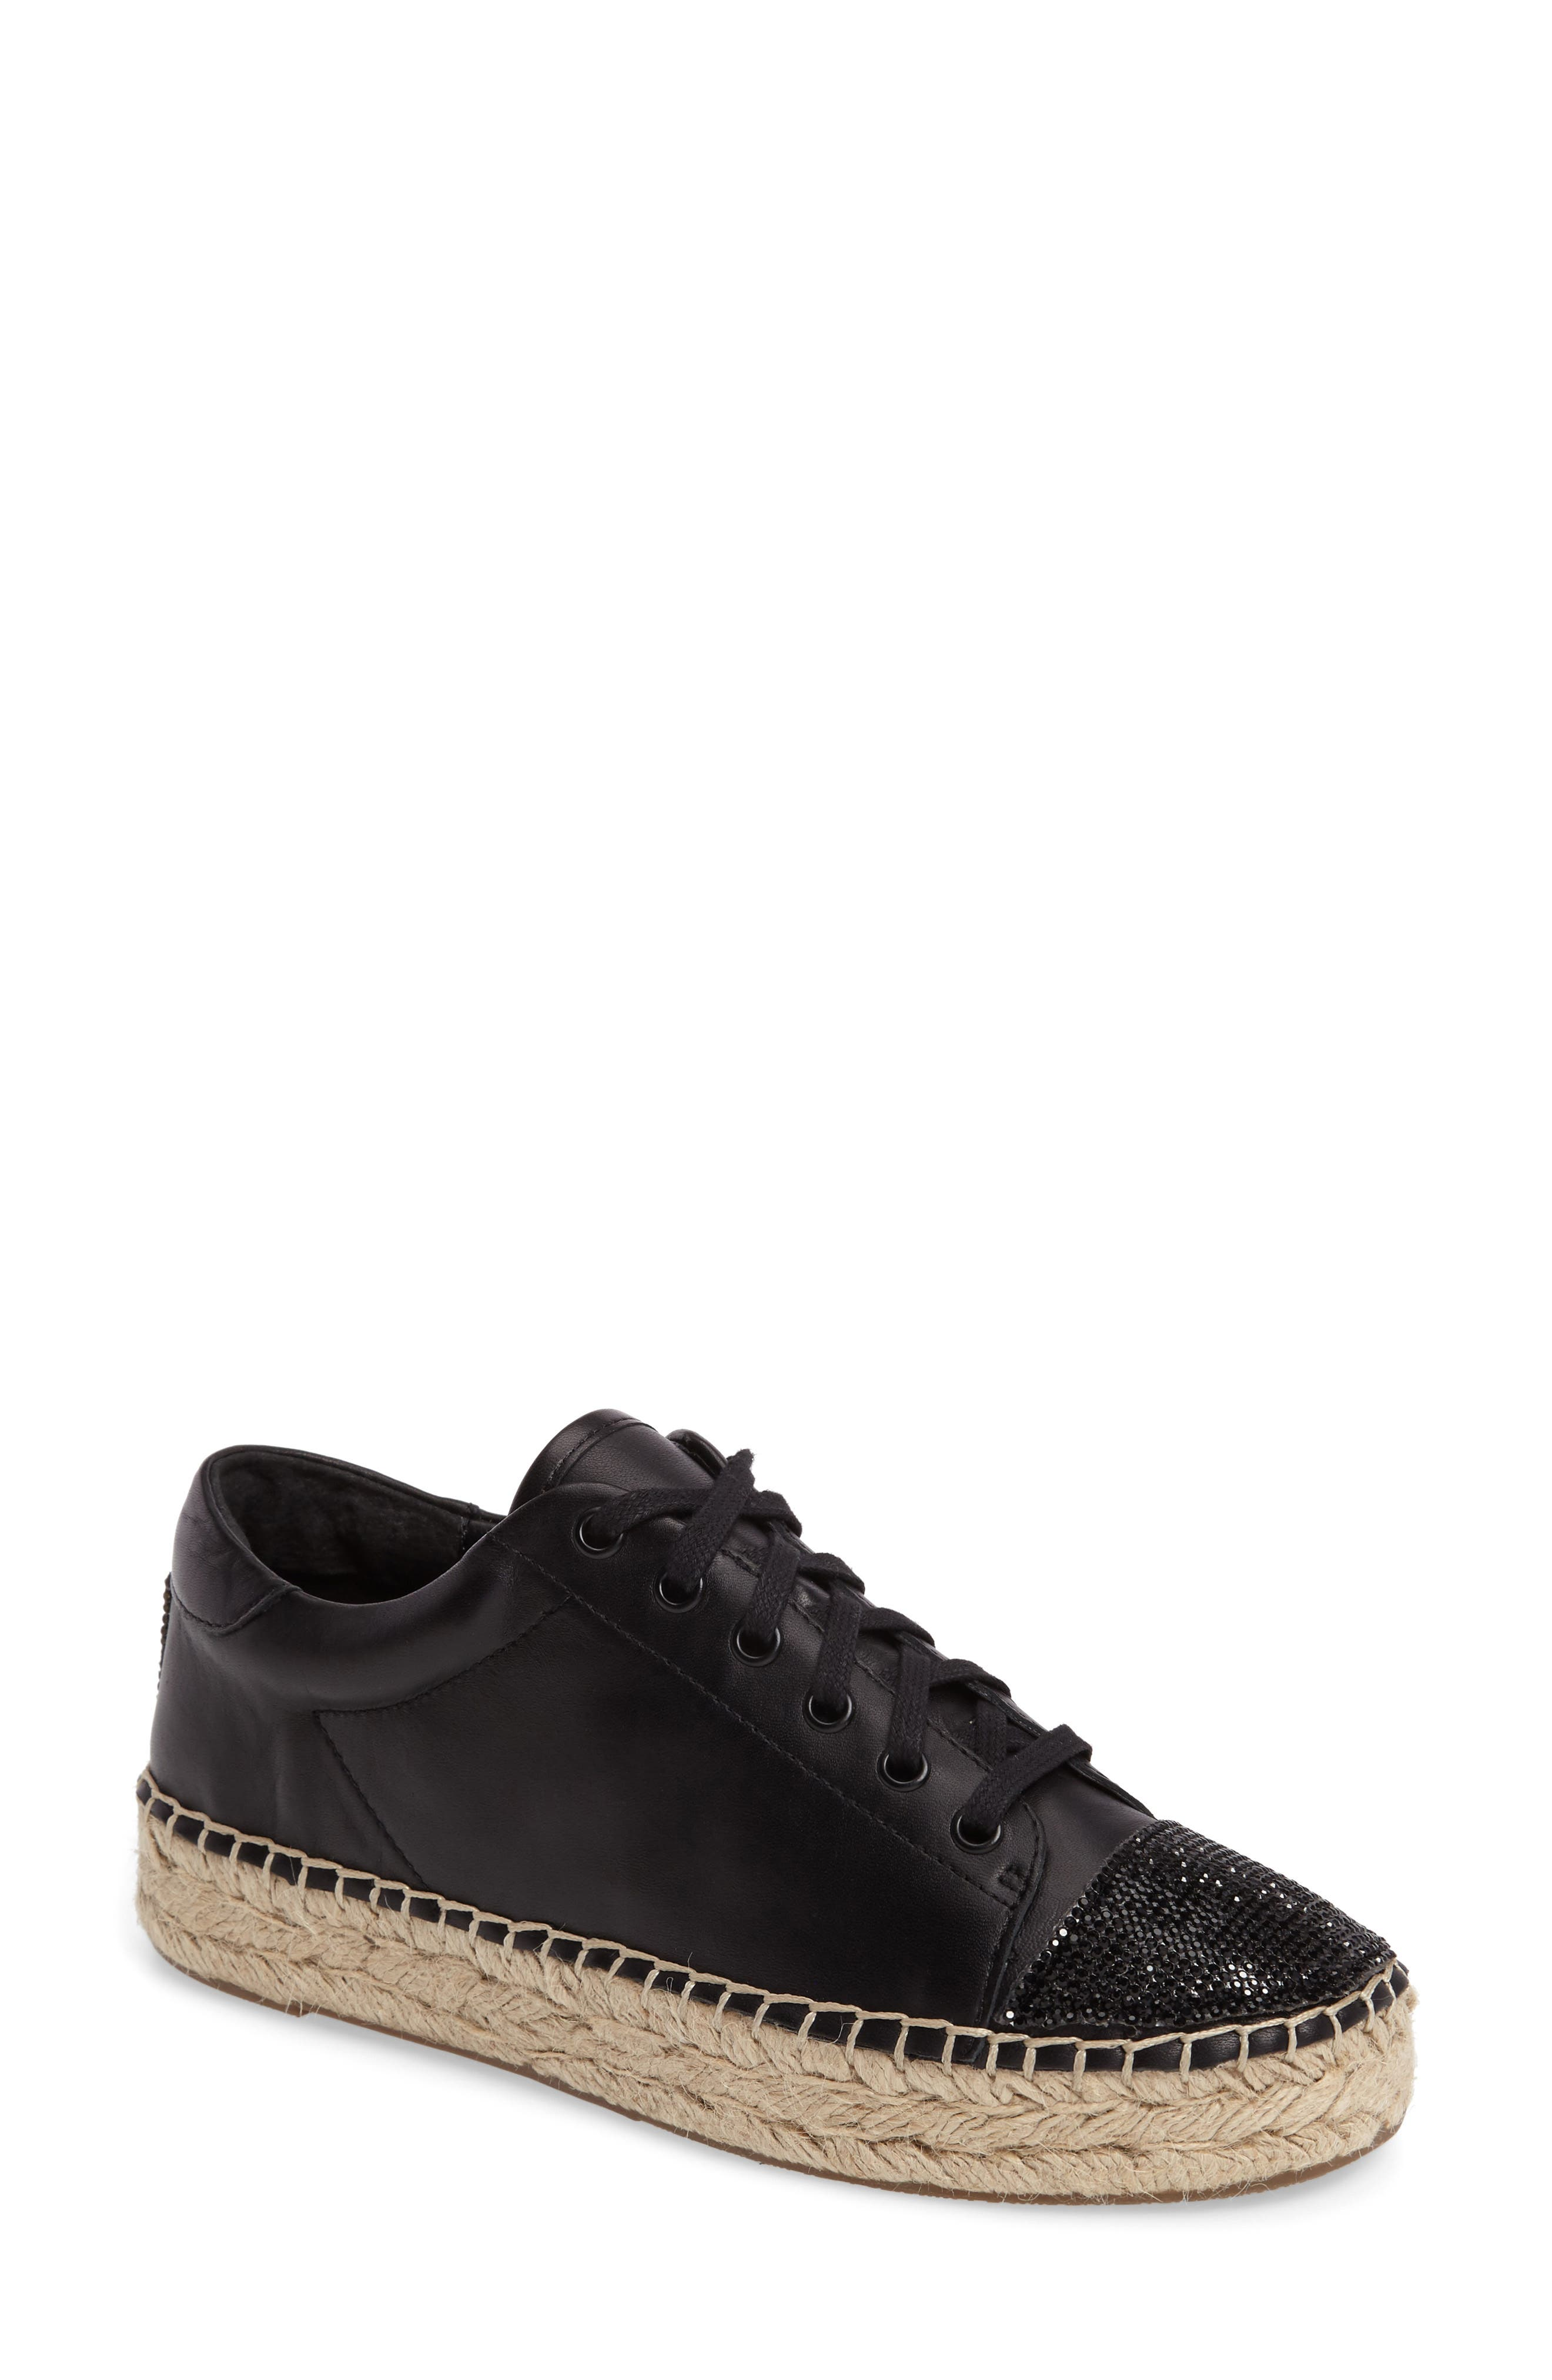 Joslyn Espadrille Sneaker,                             Main thumbnail 1, color,                             001